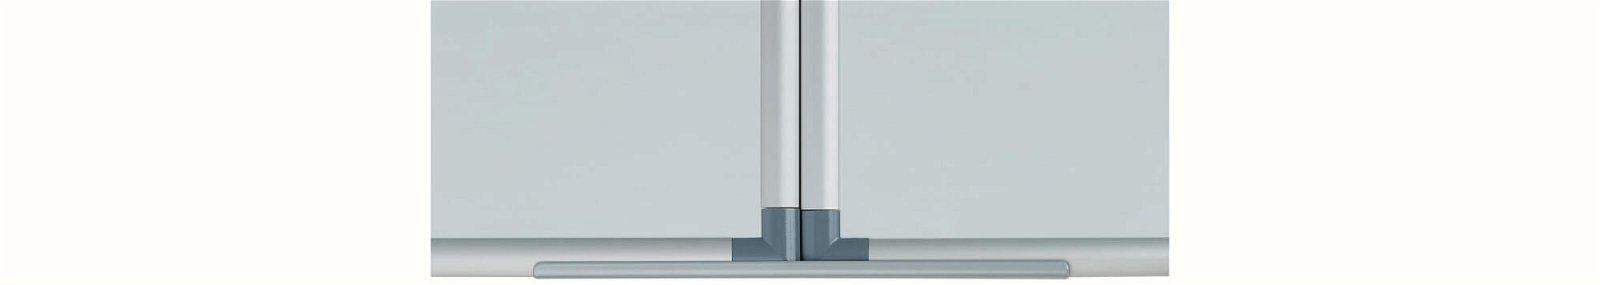 Whiteboard Klapptafel MAULpro, 100x120 cm, grau